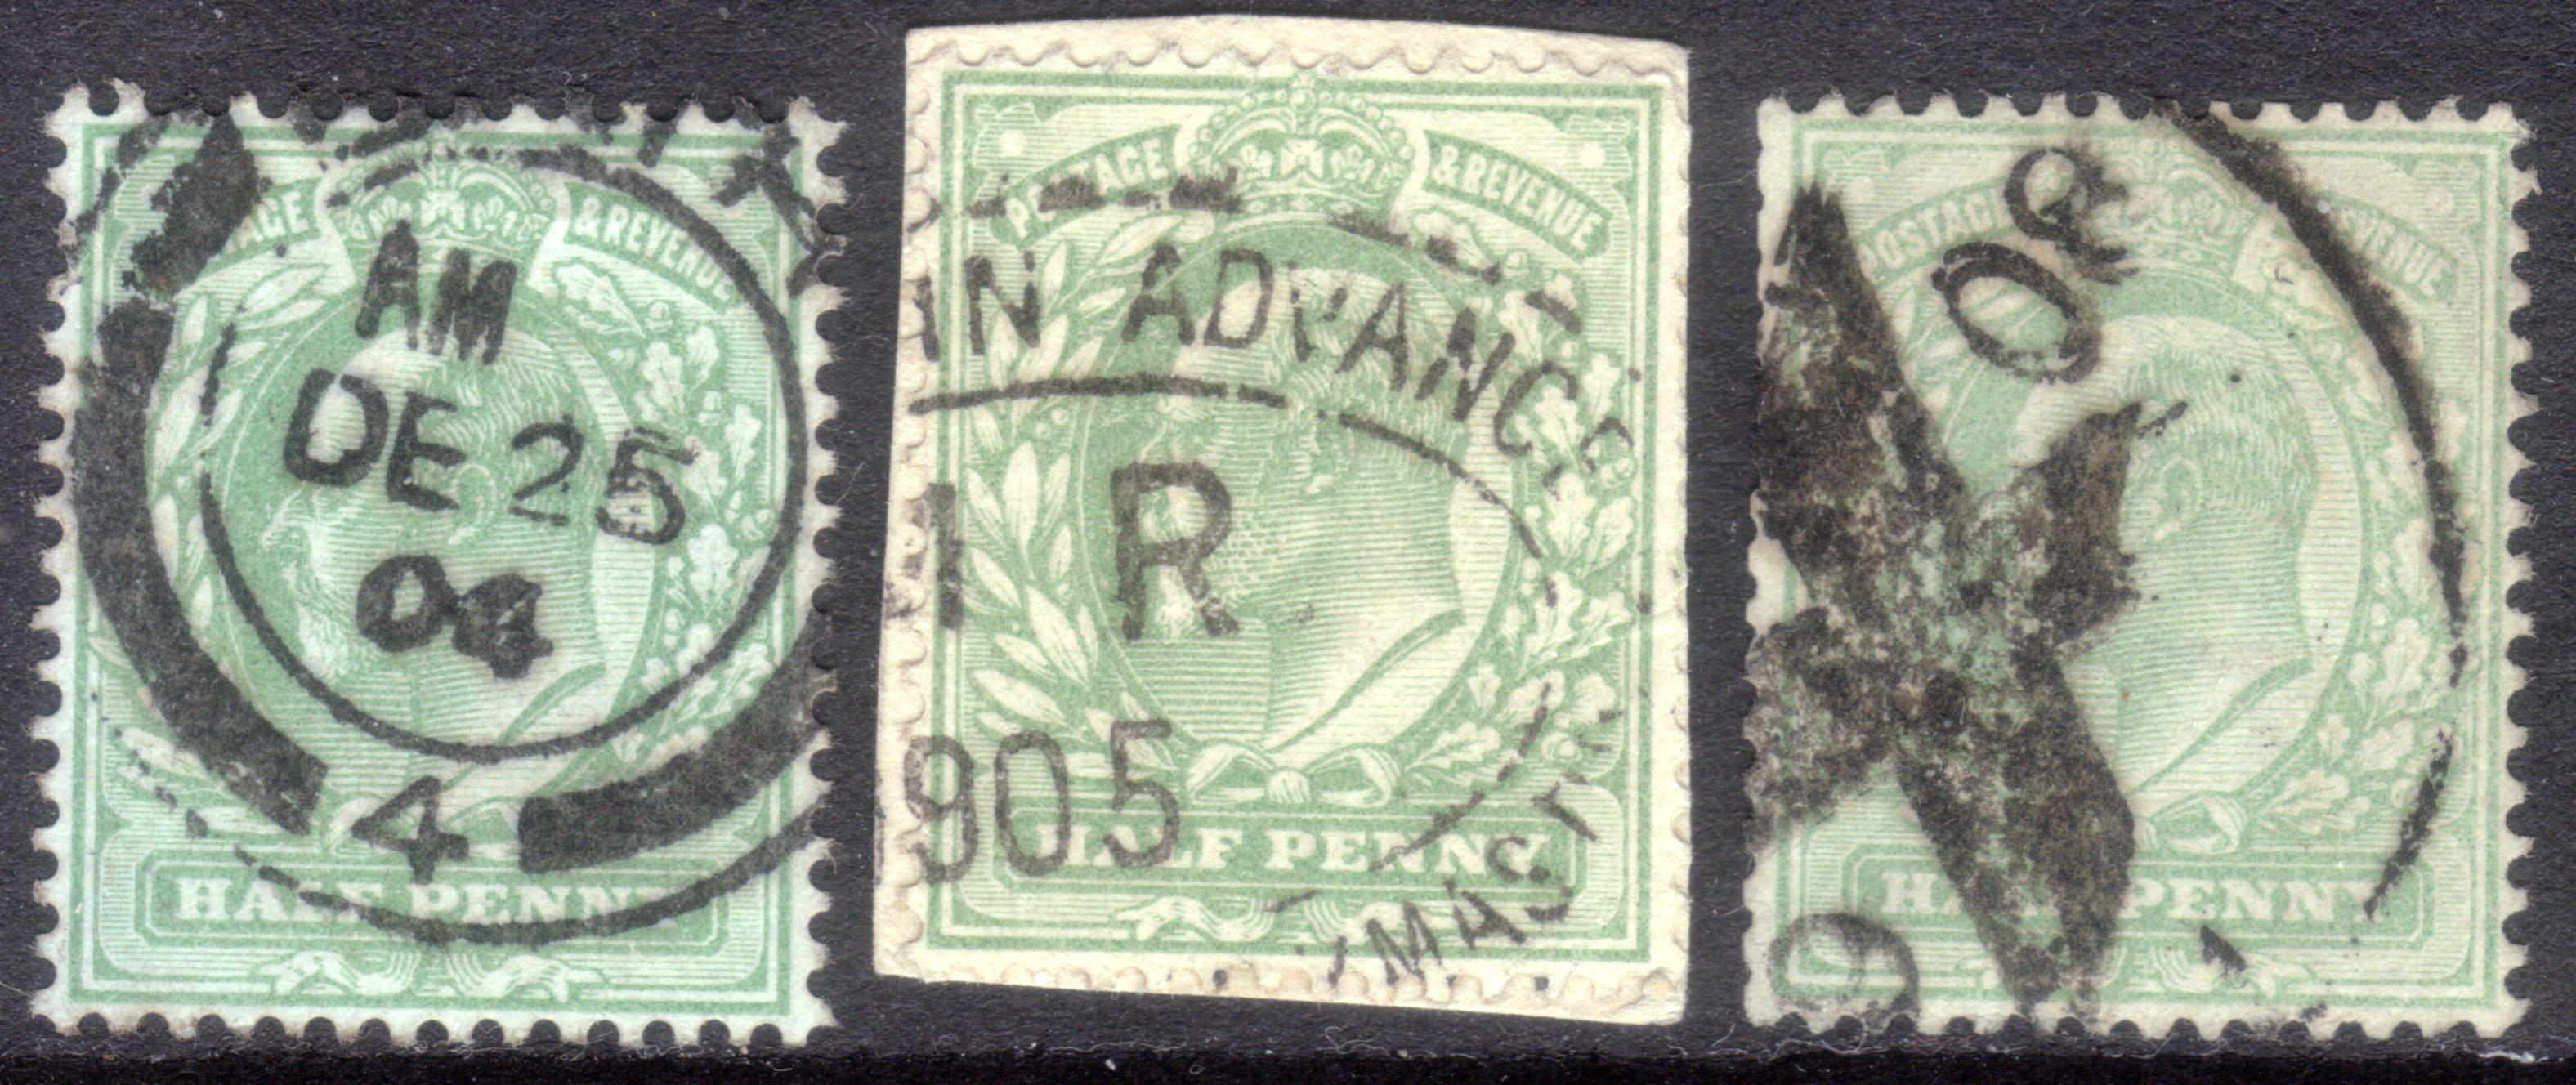 1904-08 ½d Yellowish Green Xmas Cancels